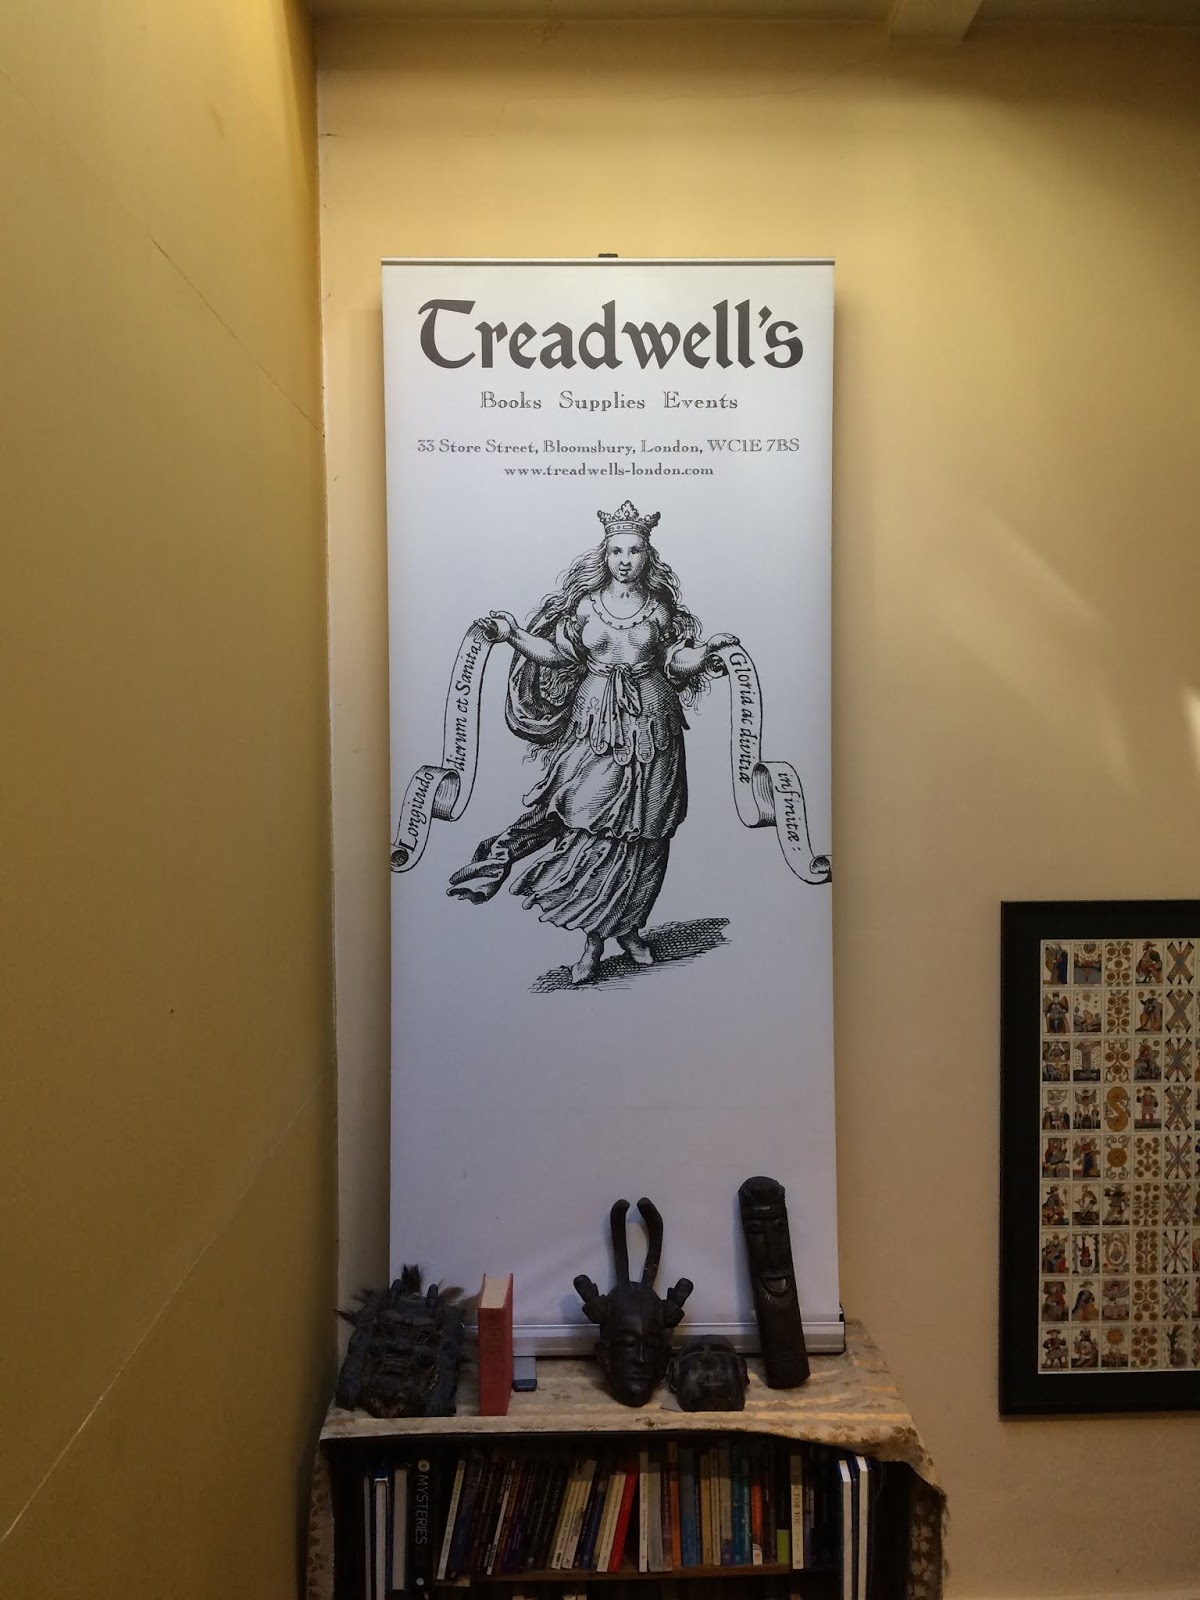 Inside Treadwell's